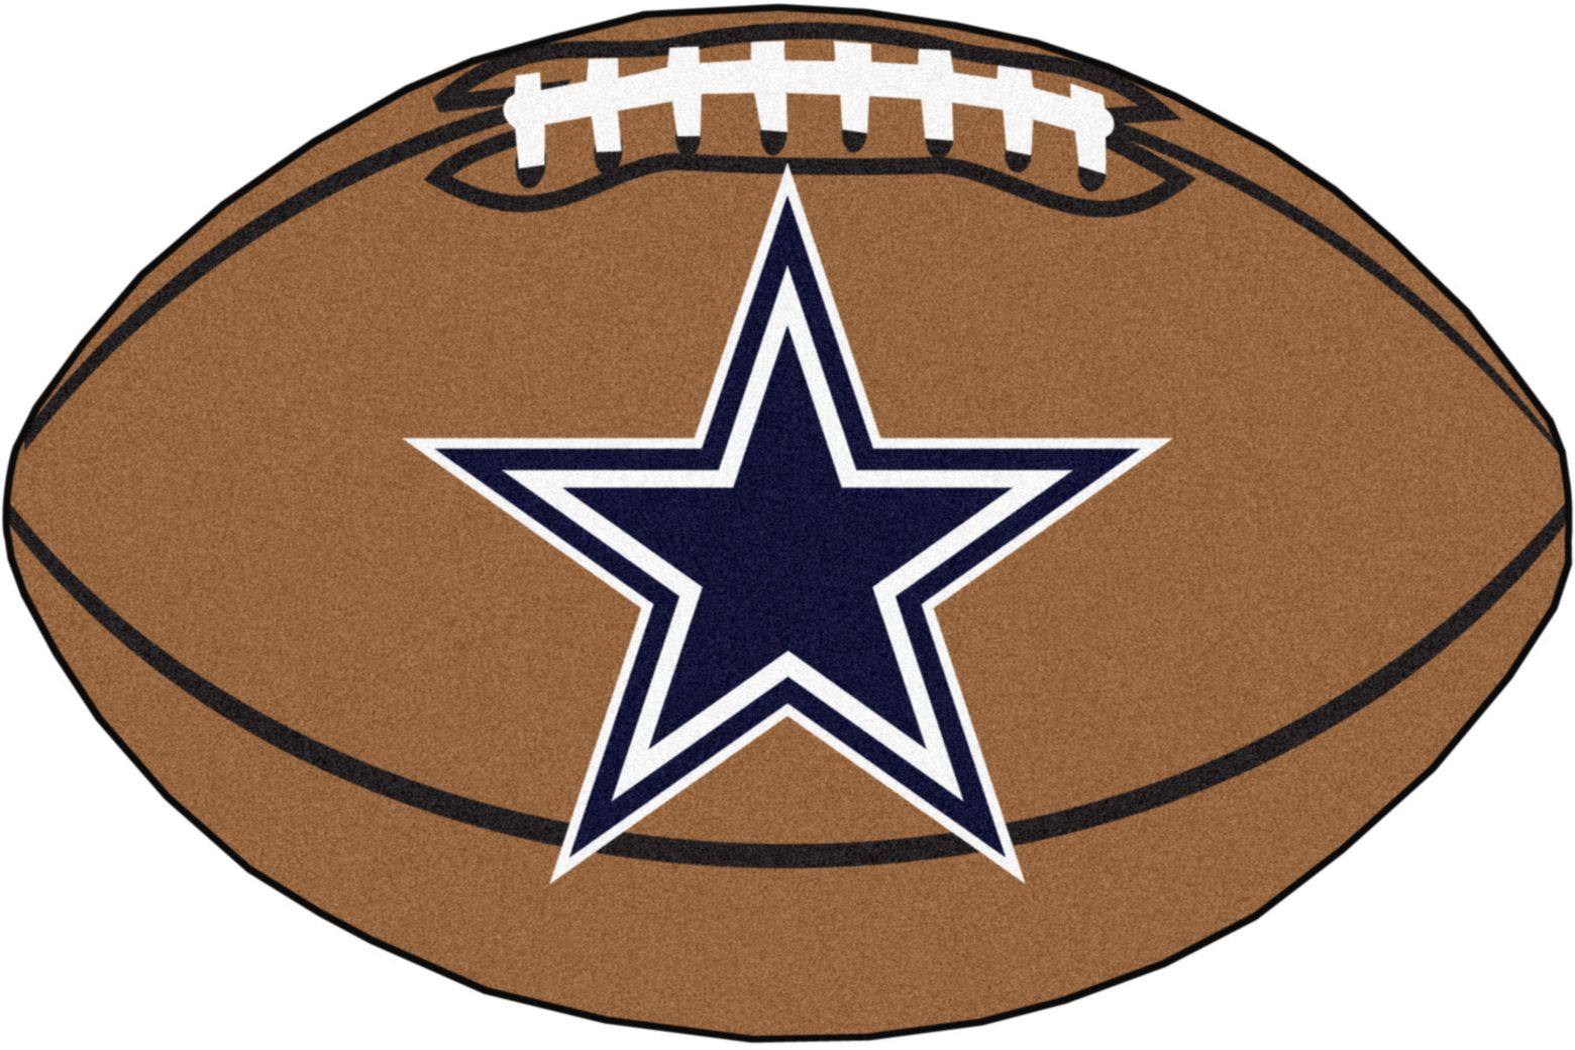 "NFL Football Mascot Dallas Cowboys 1'6""x 1'10"" Rug"